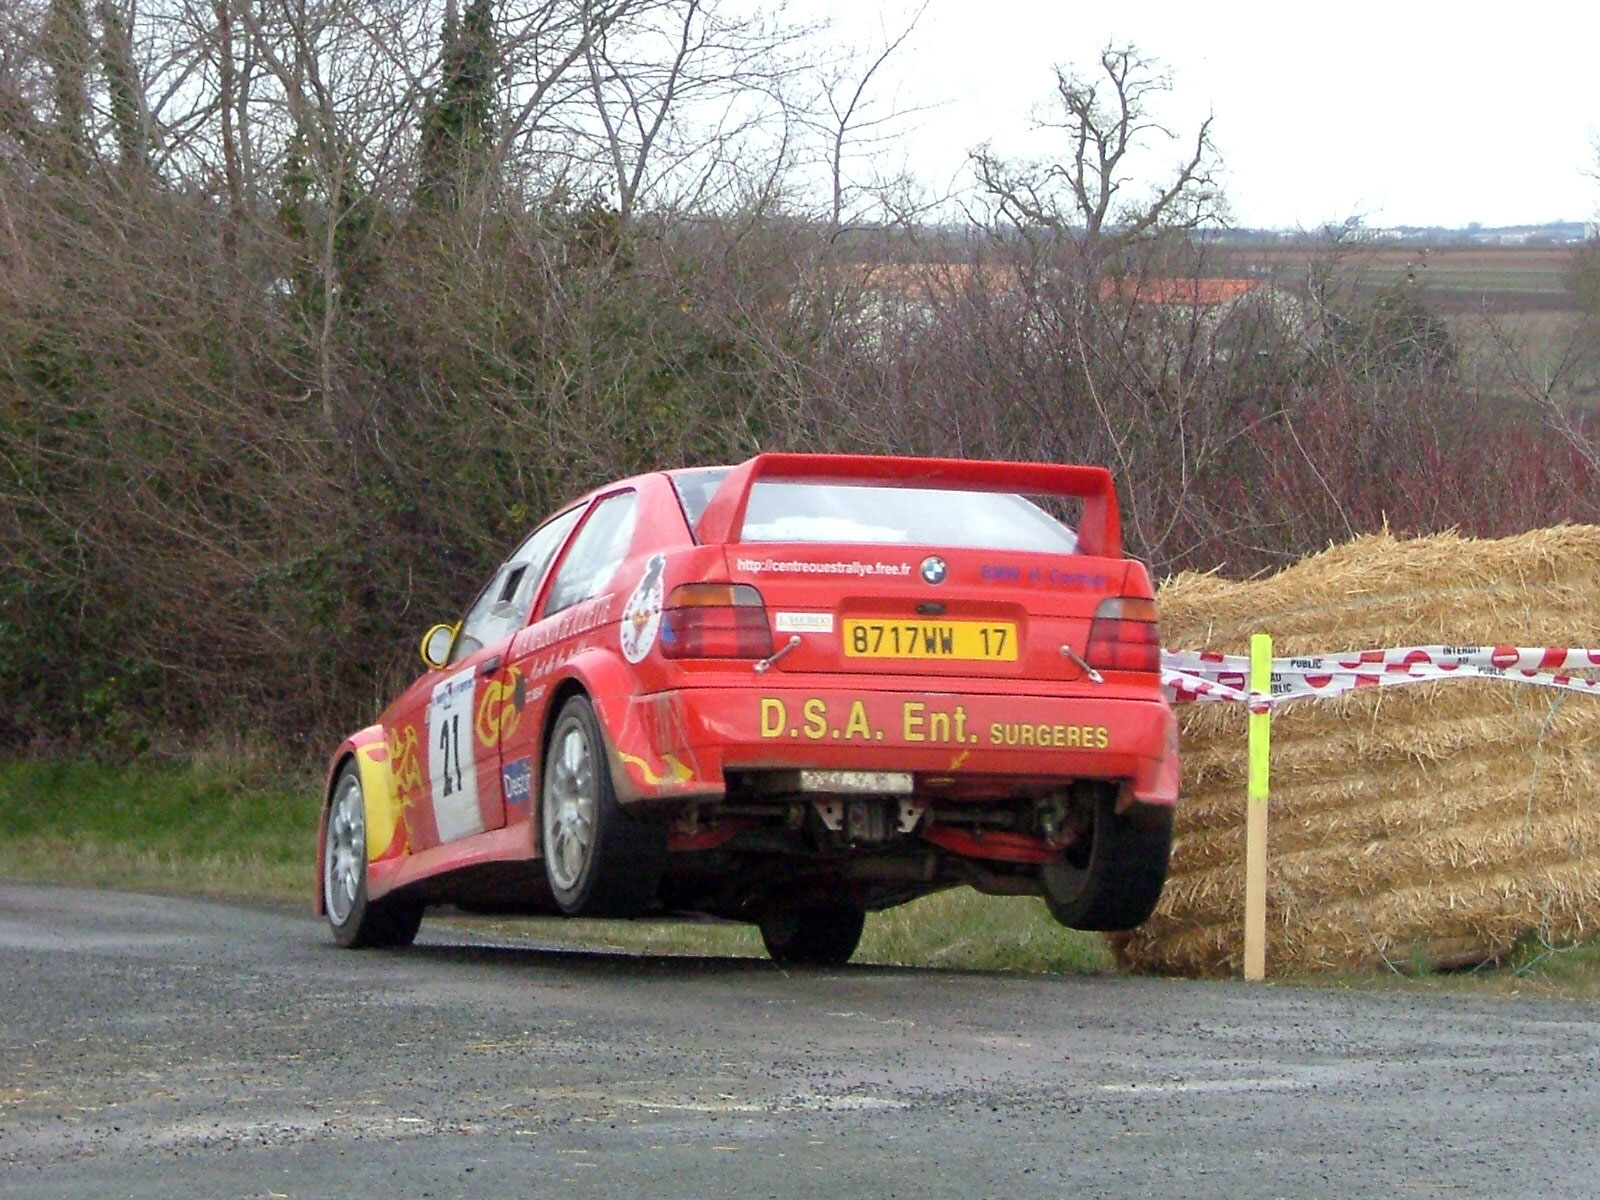 Rallye du Pays d'Aunis 2005 - # 21 - BMW 318 TI Compact [1A]